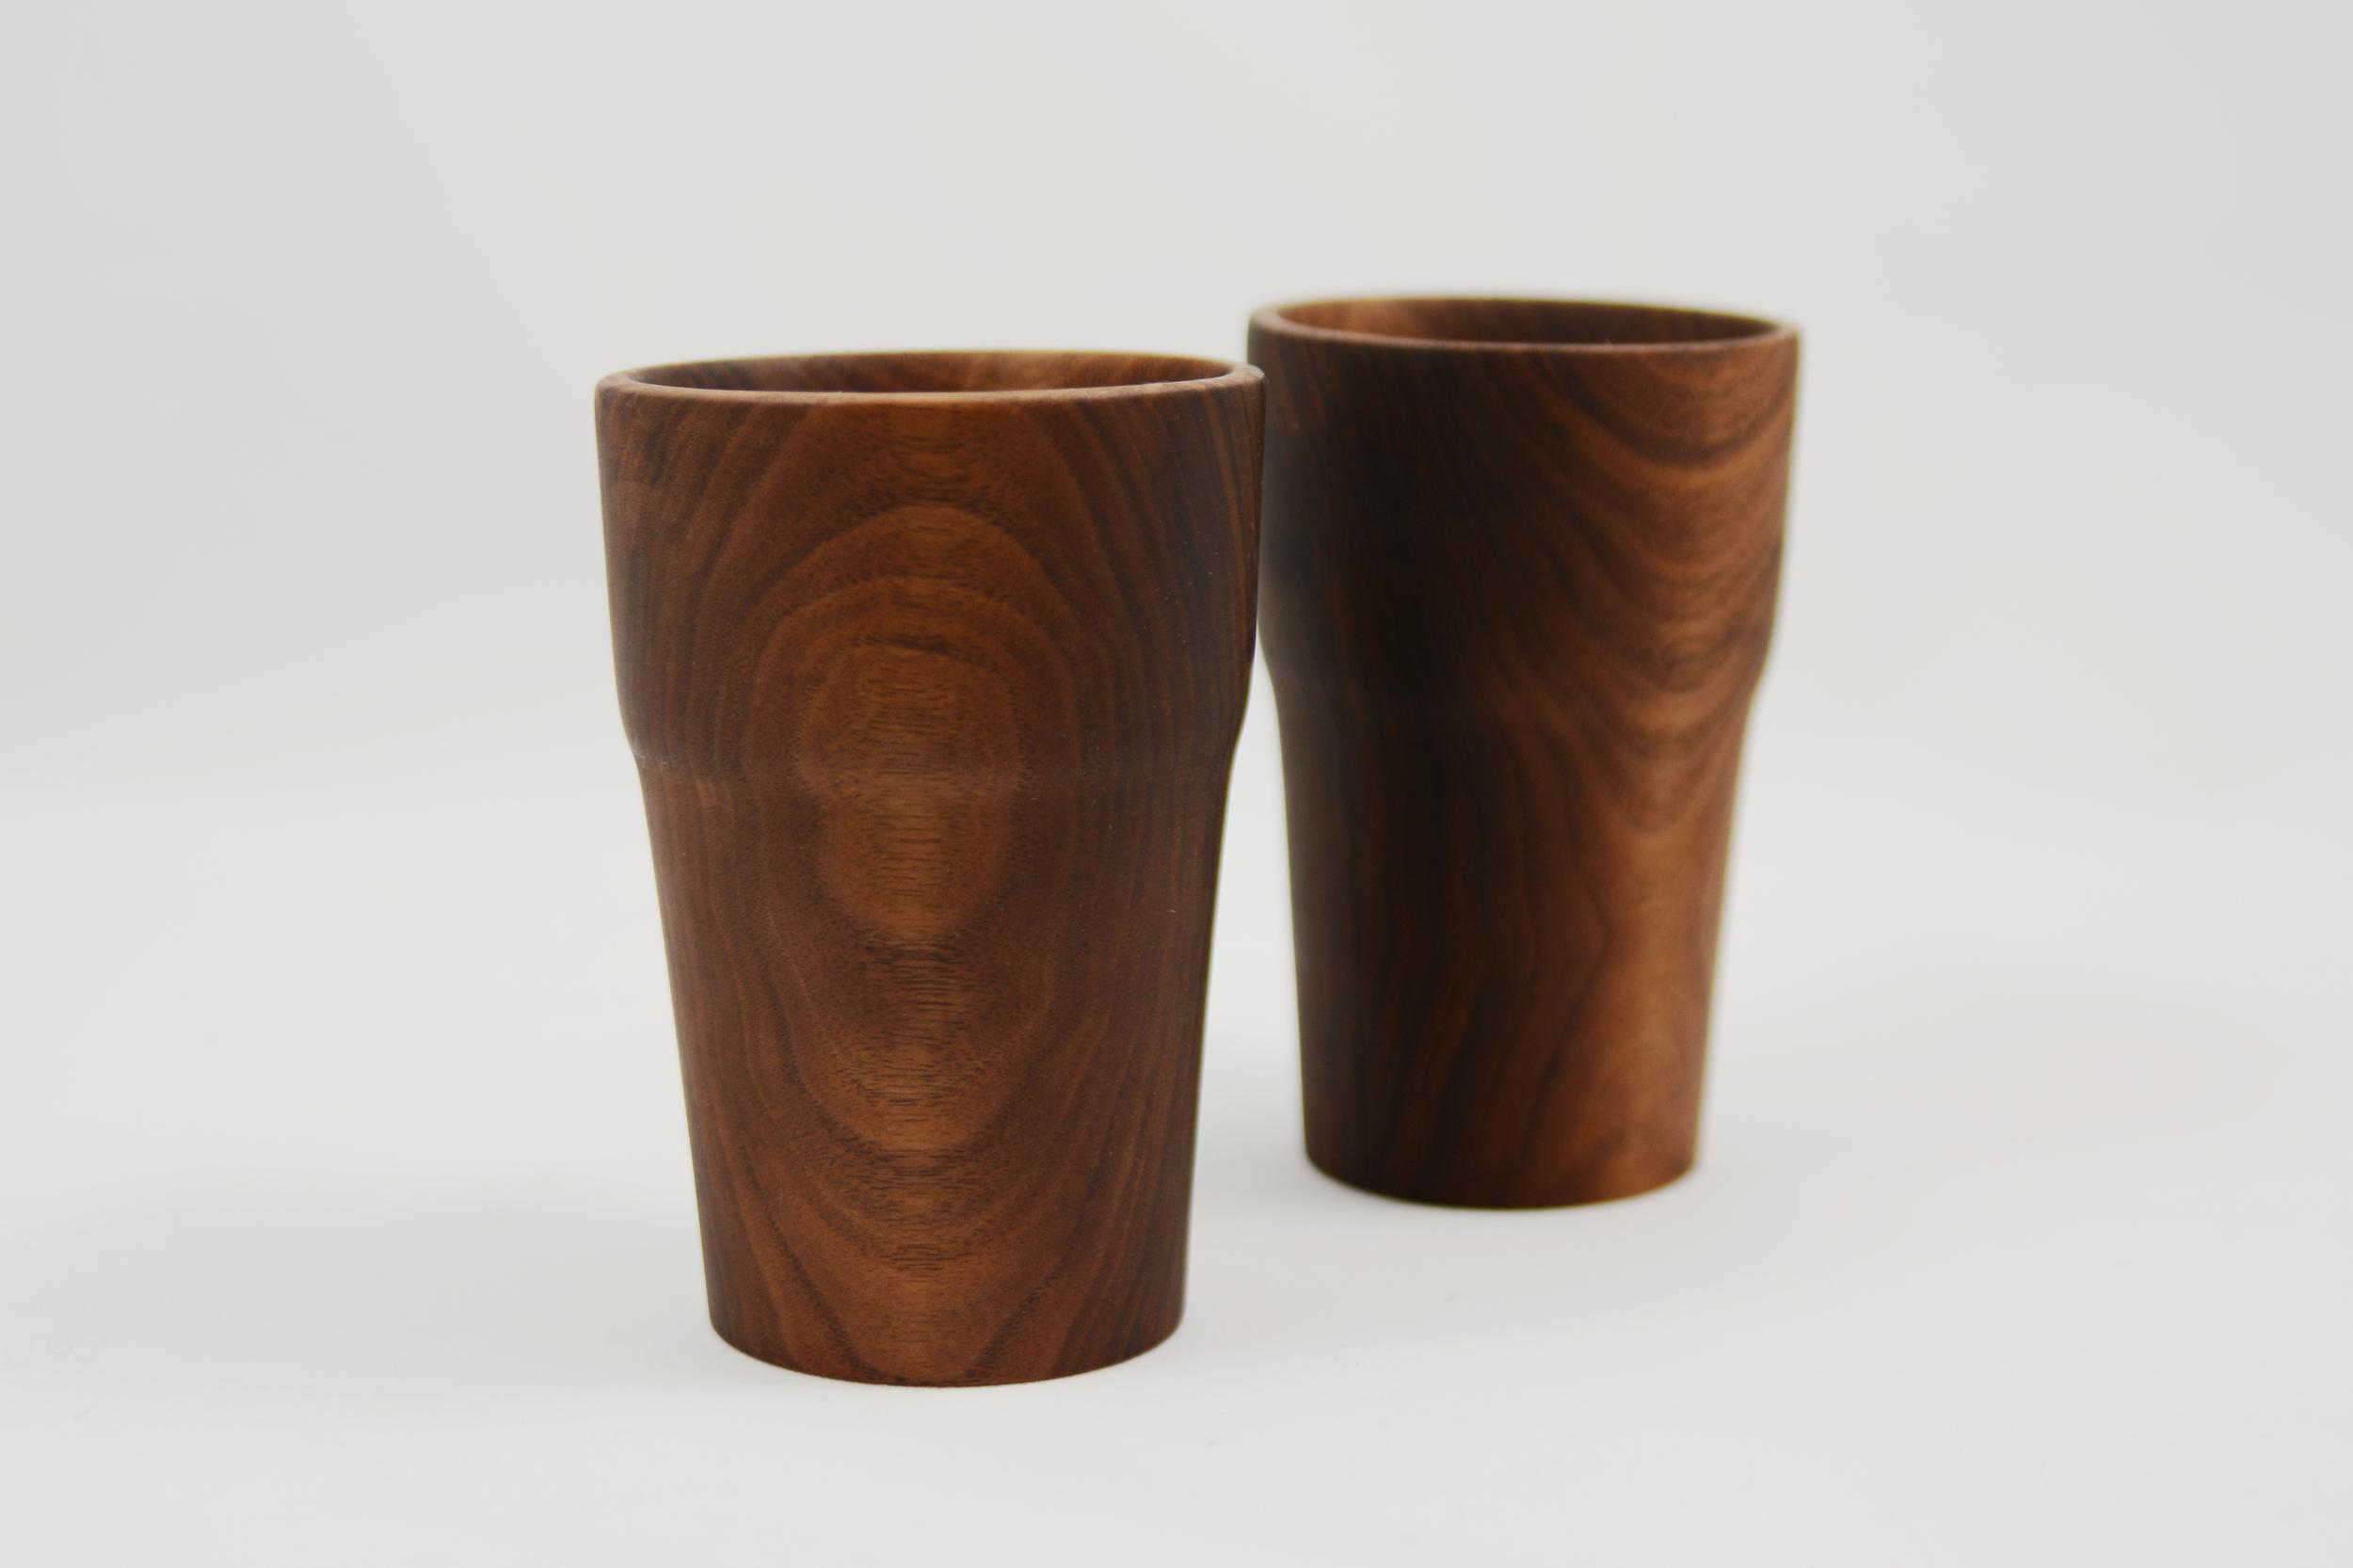 cup: walnut